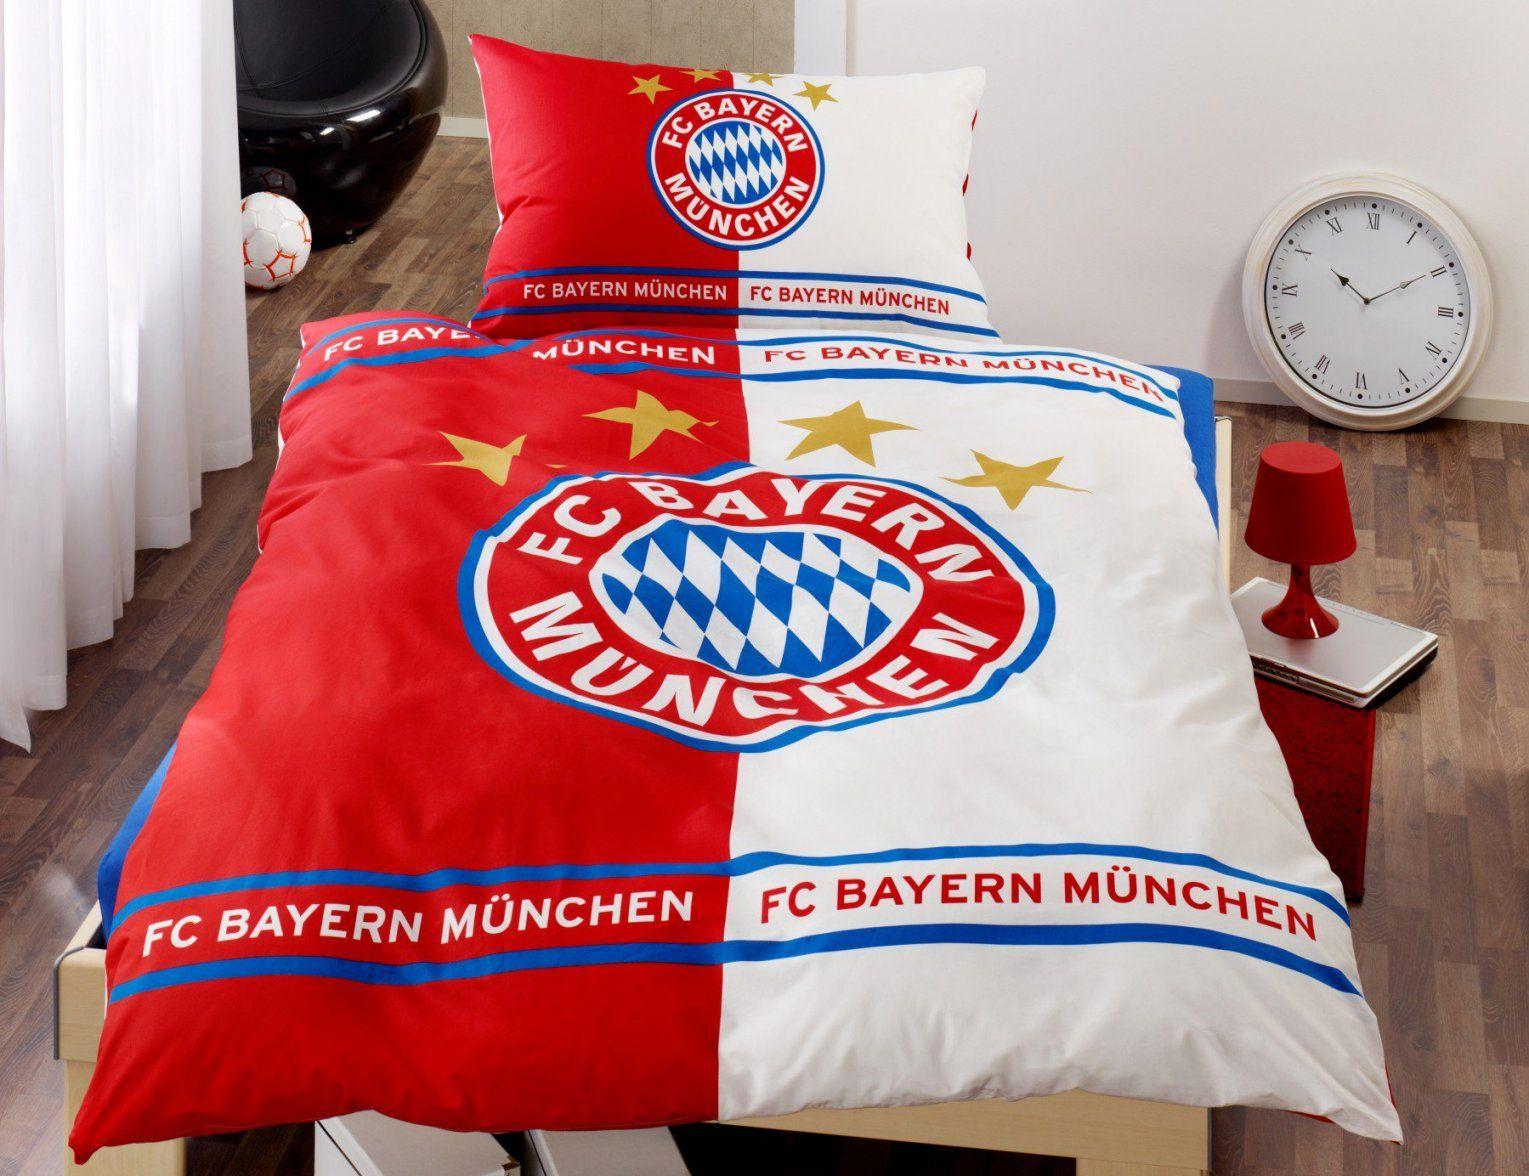 Fc Bayern Bettwäsche Günstig  Bettwaeschech von Fc Bayern Bettwäsche Günstig Bild